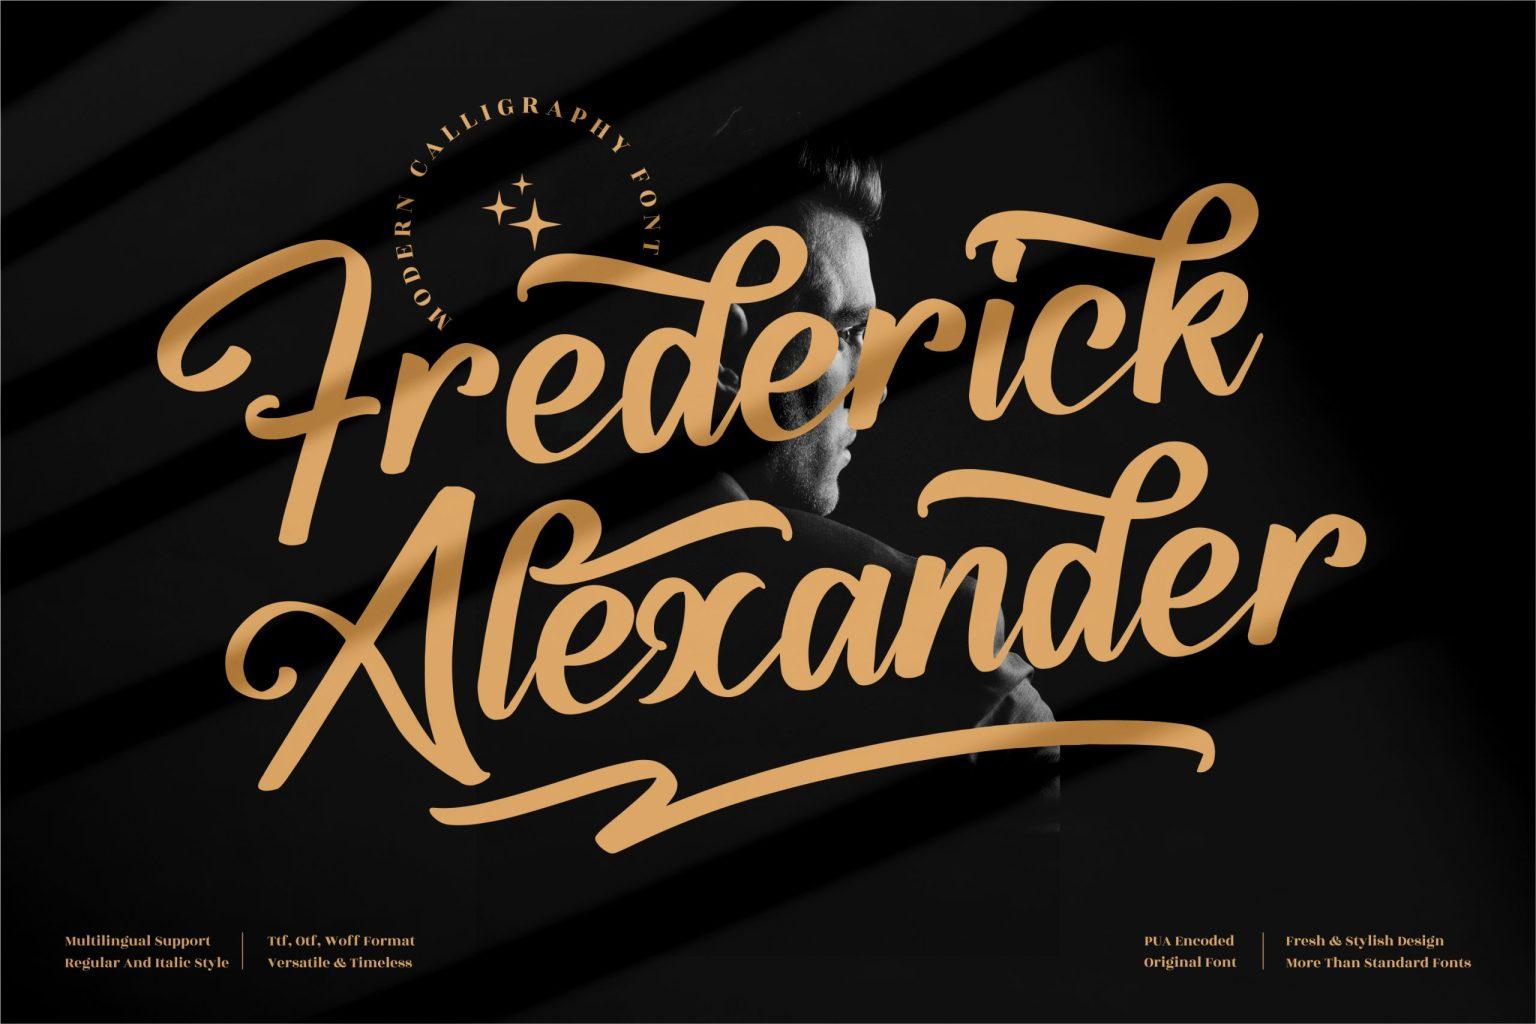 Frederick Alexander Script Font